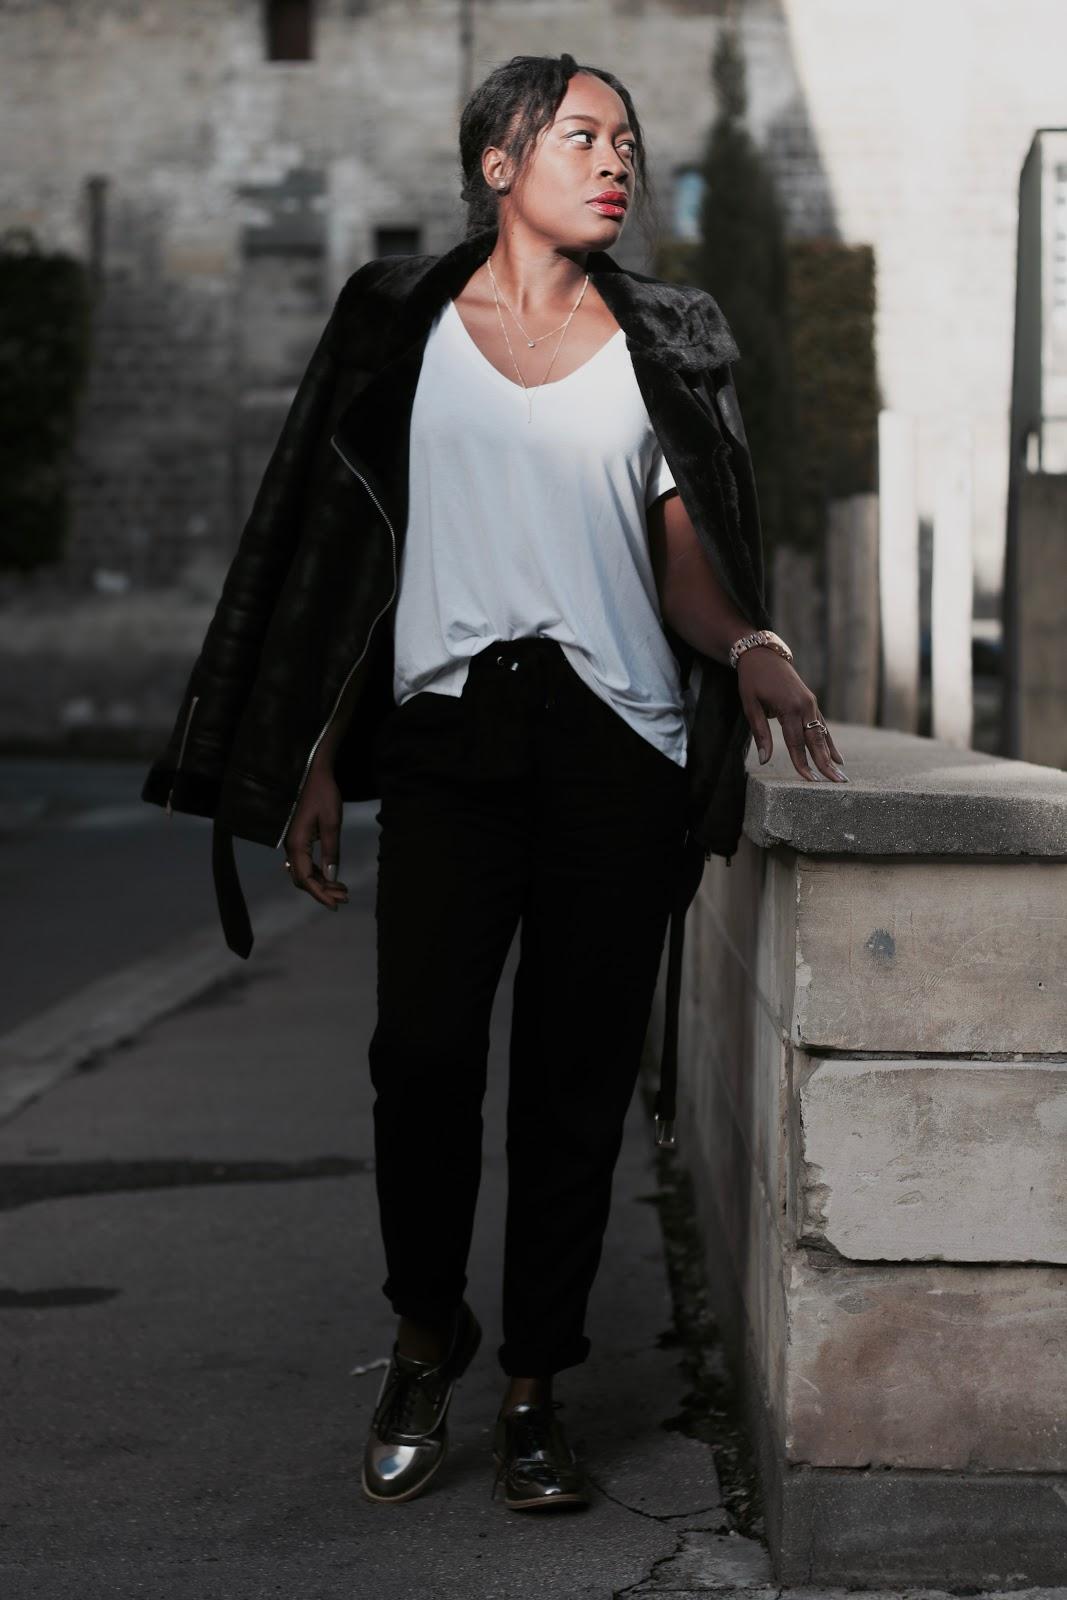 fashion-blogger-black-and-white